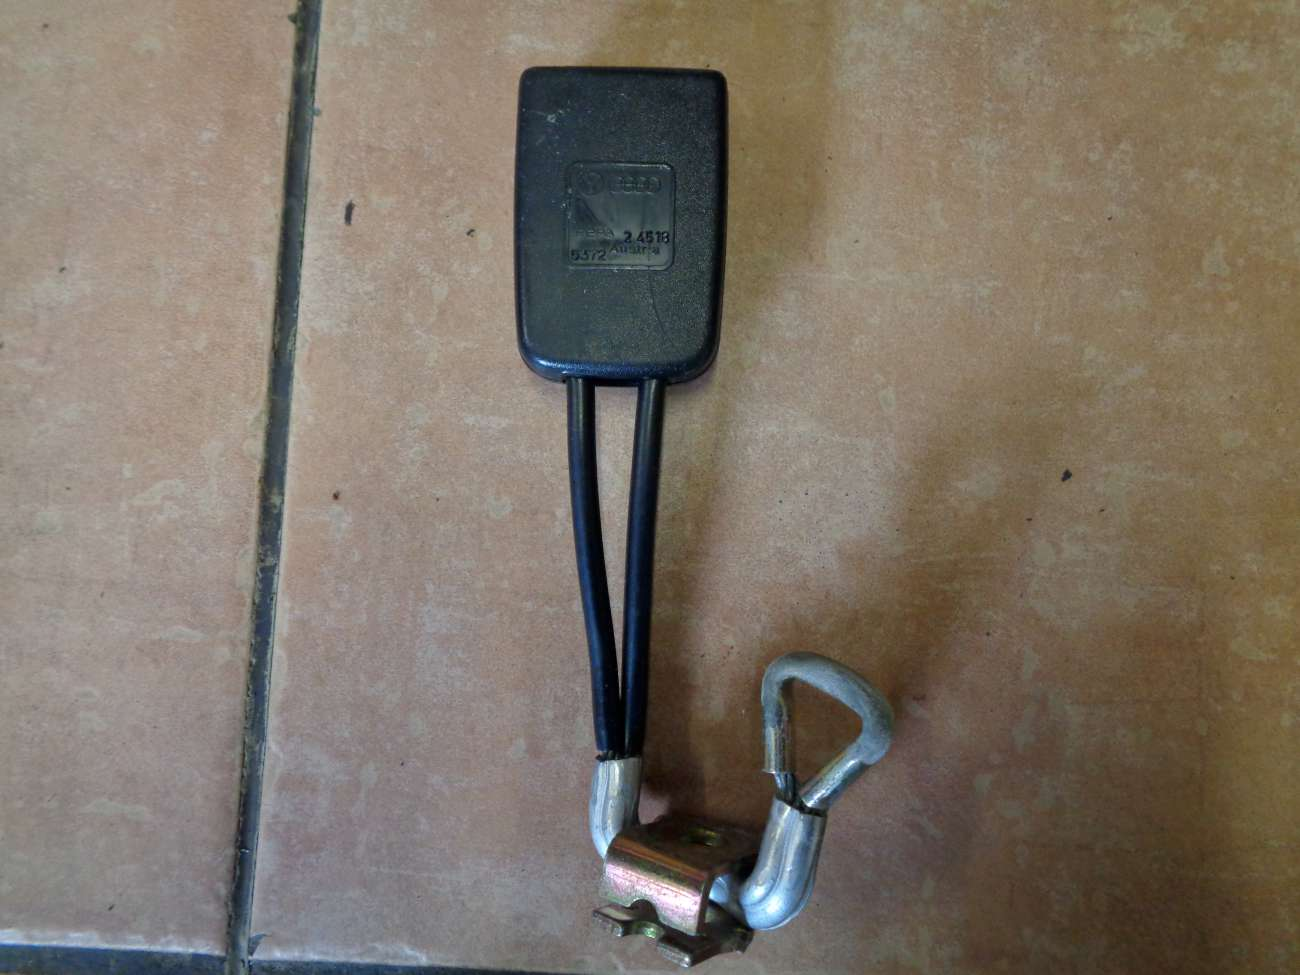 VW Passat 35i Sicherheitsgurt Hinten Mitte Gurtschloss 357857713B